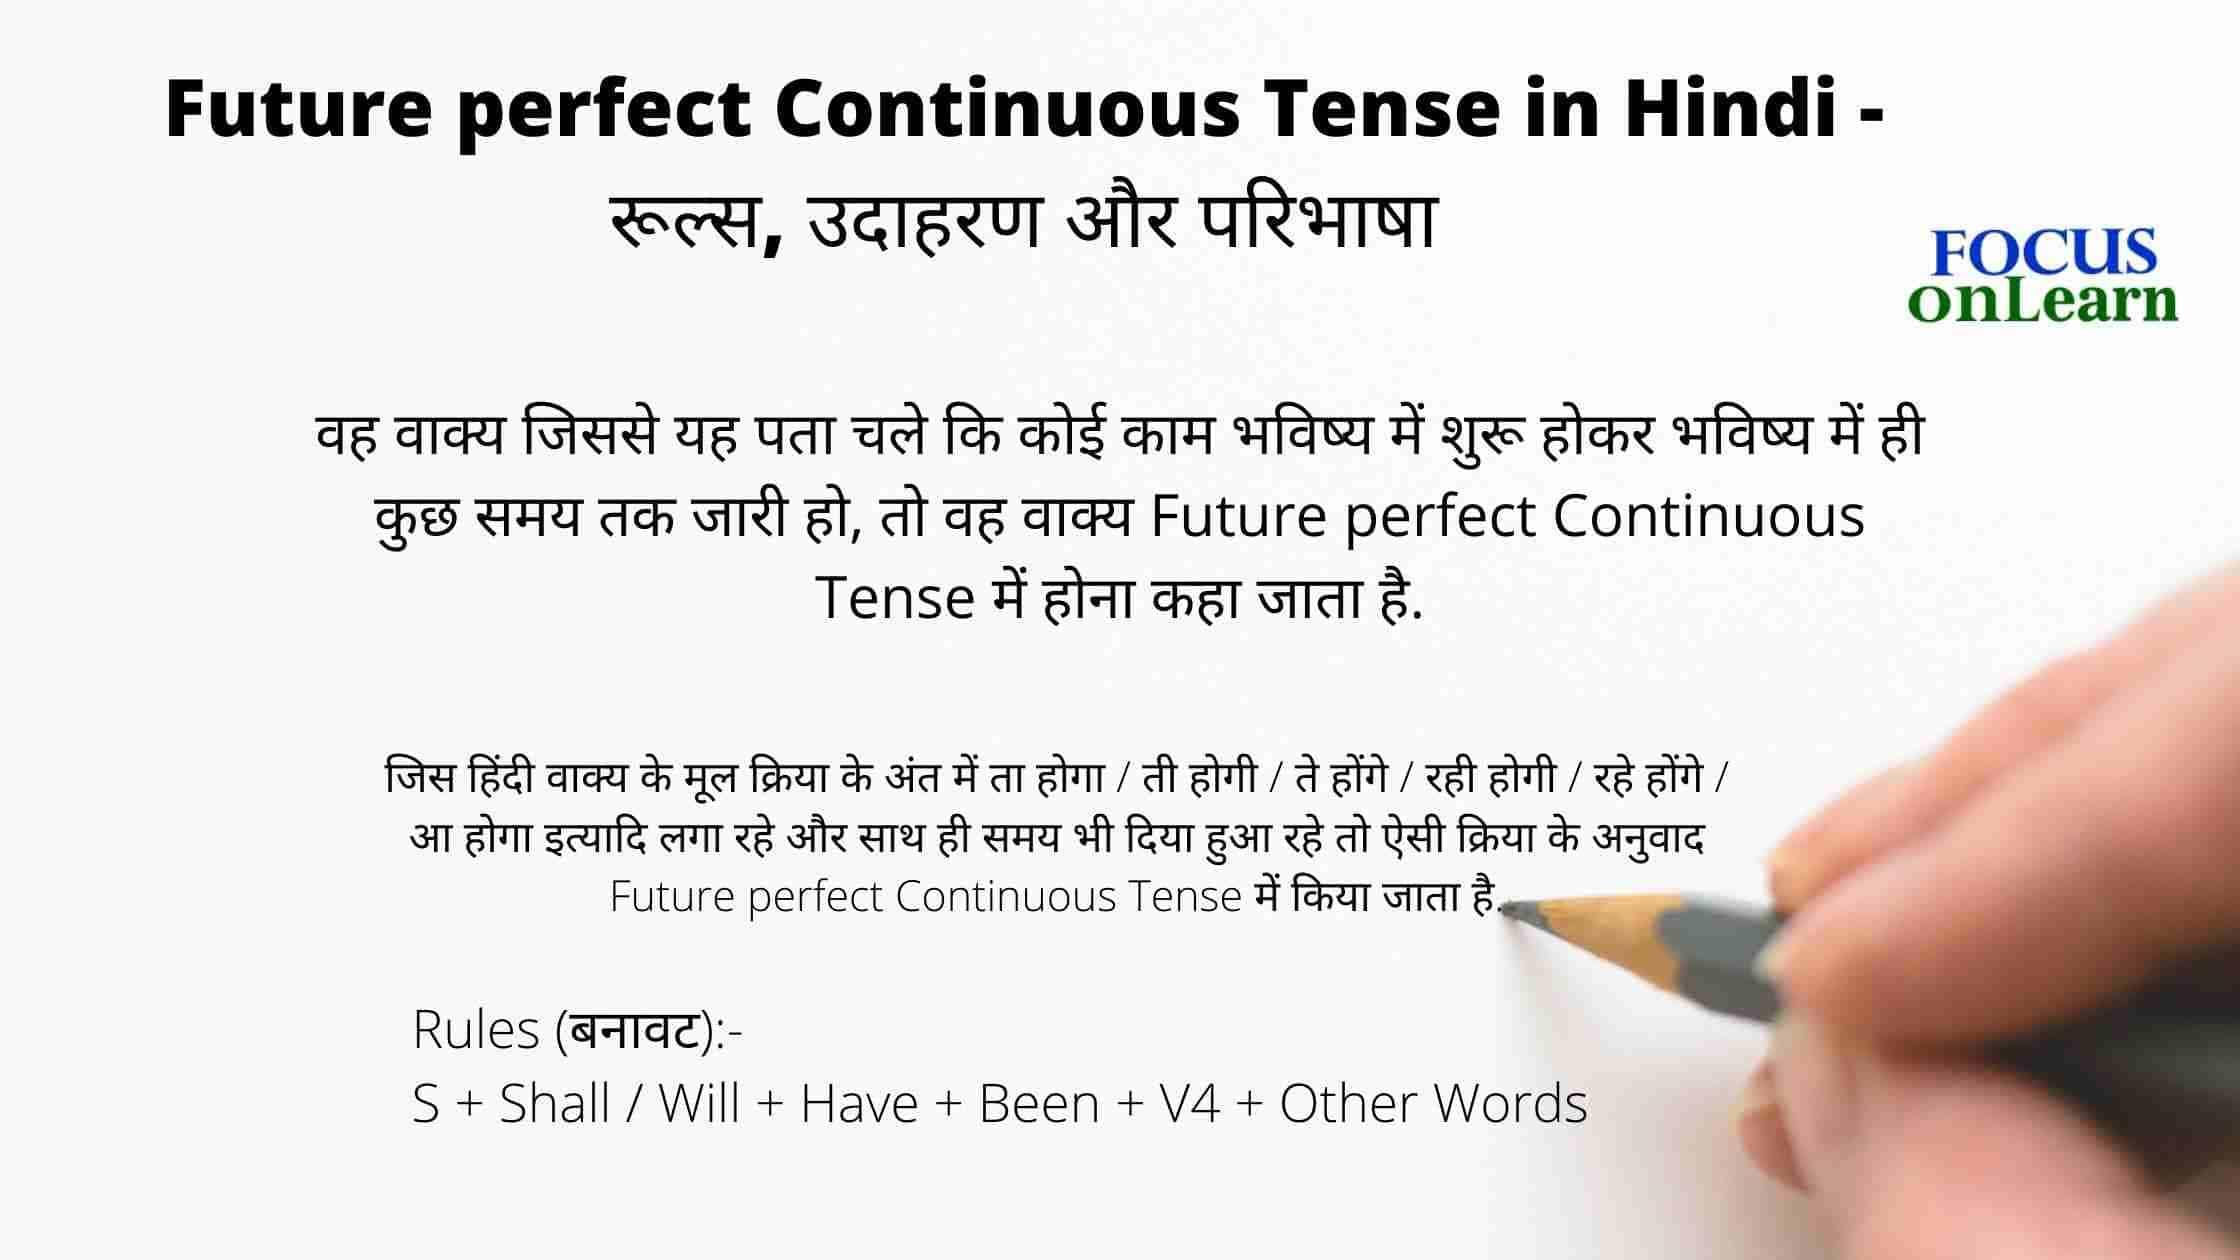 Future perfect Continuous Tense in Hindi